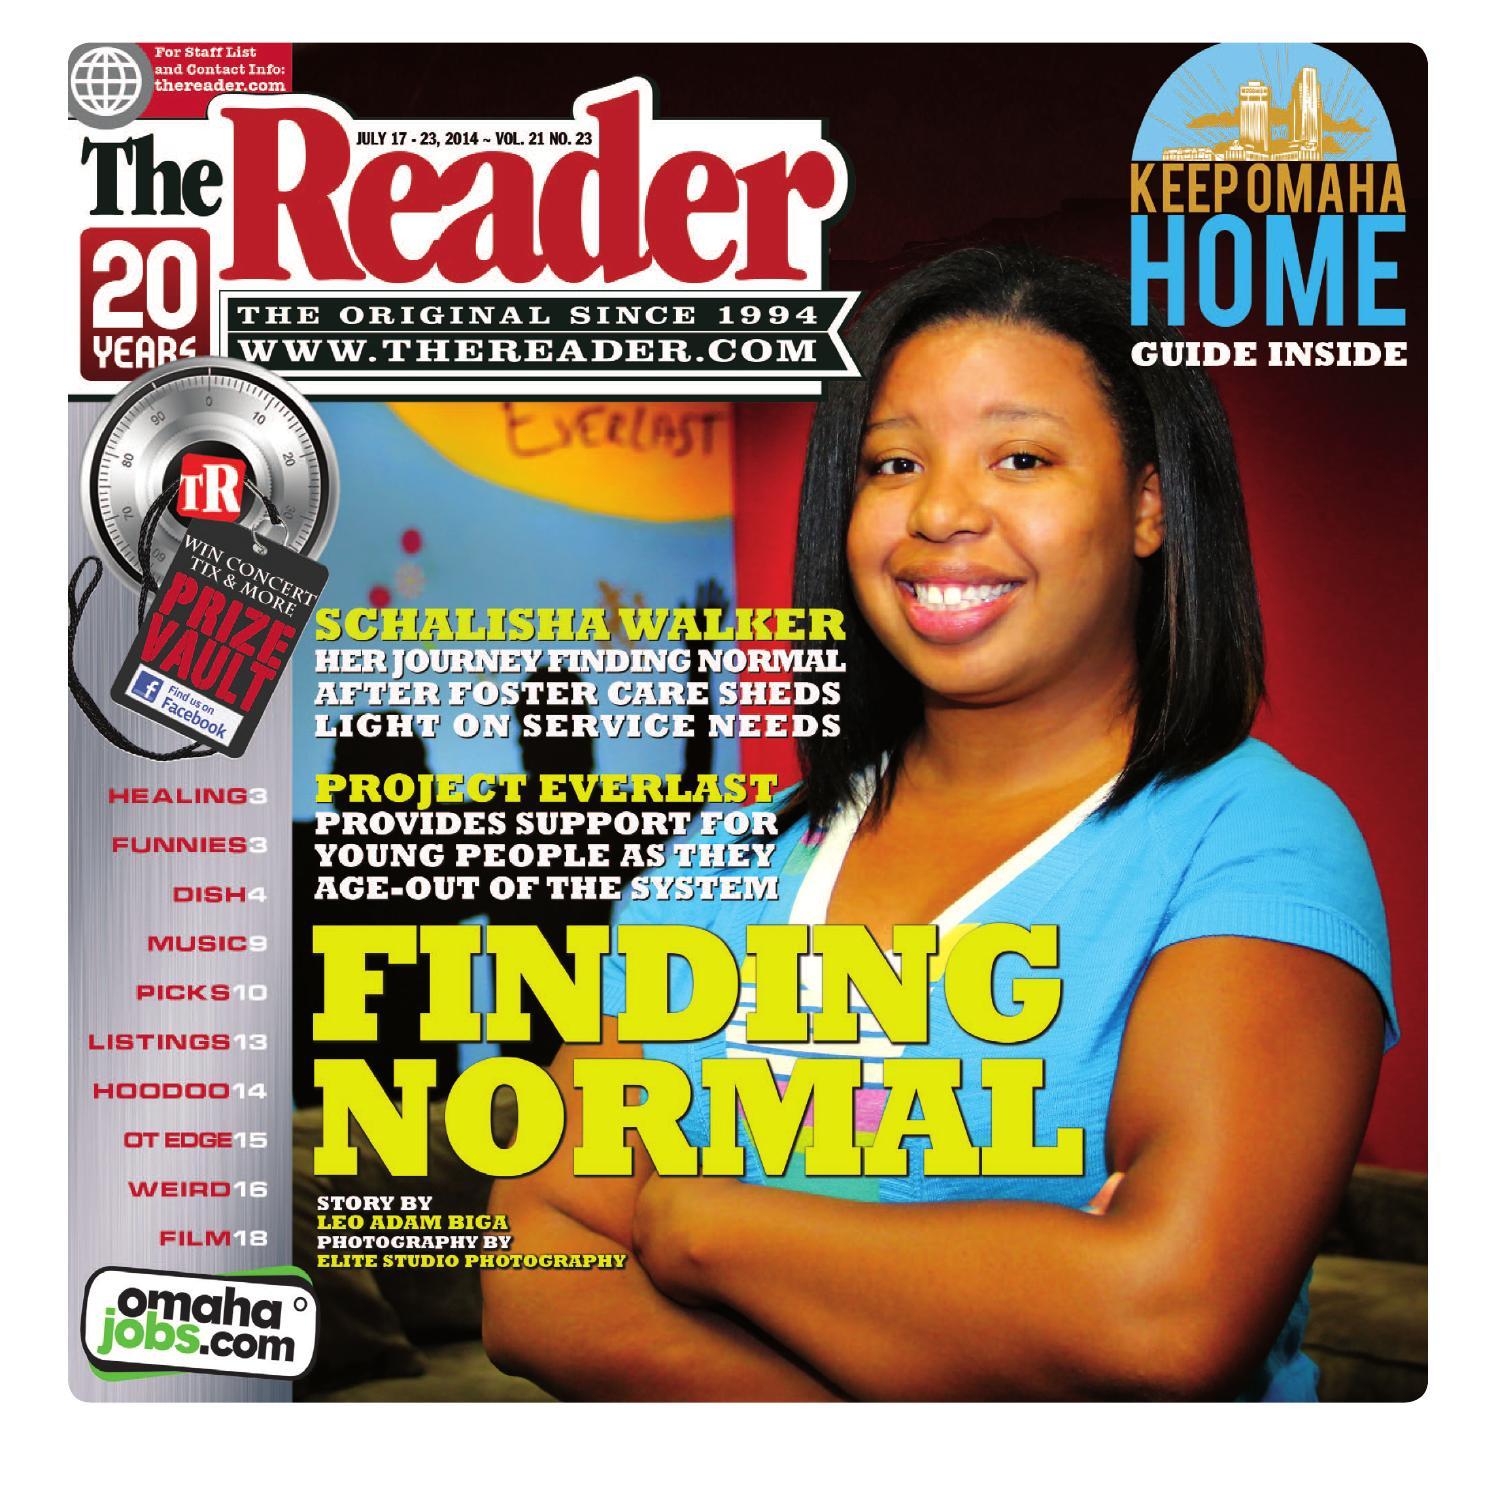 The Reader July 17 23 2014 By Pioneermedia Me Issuu